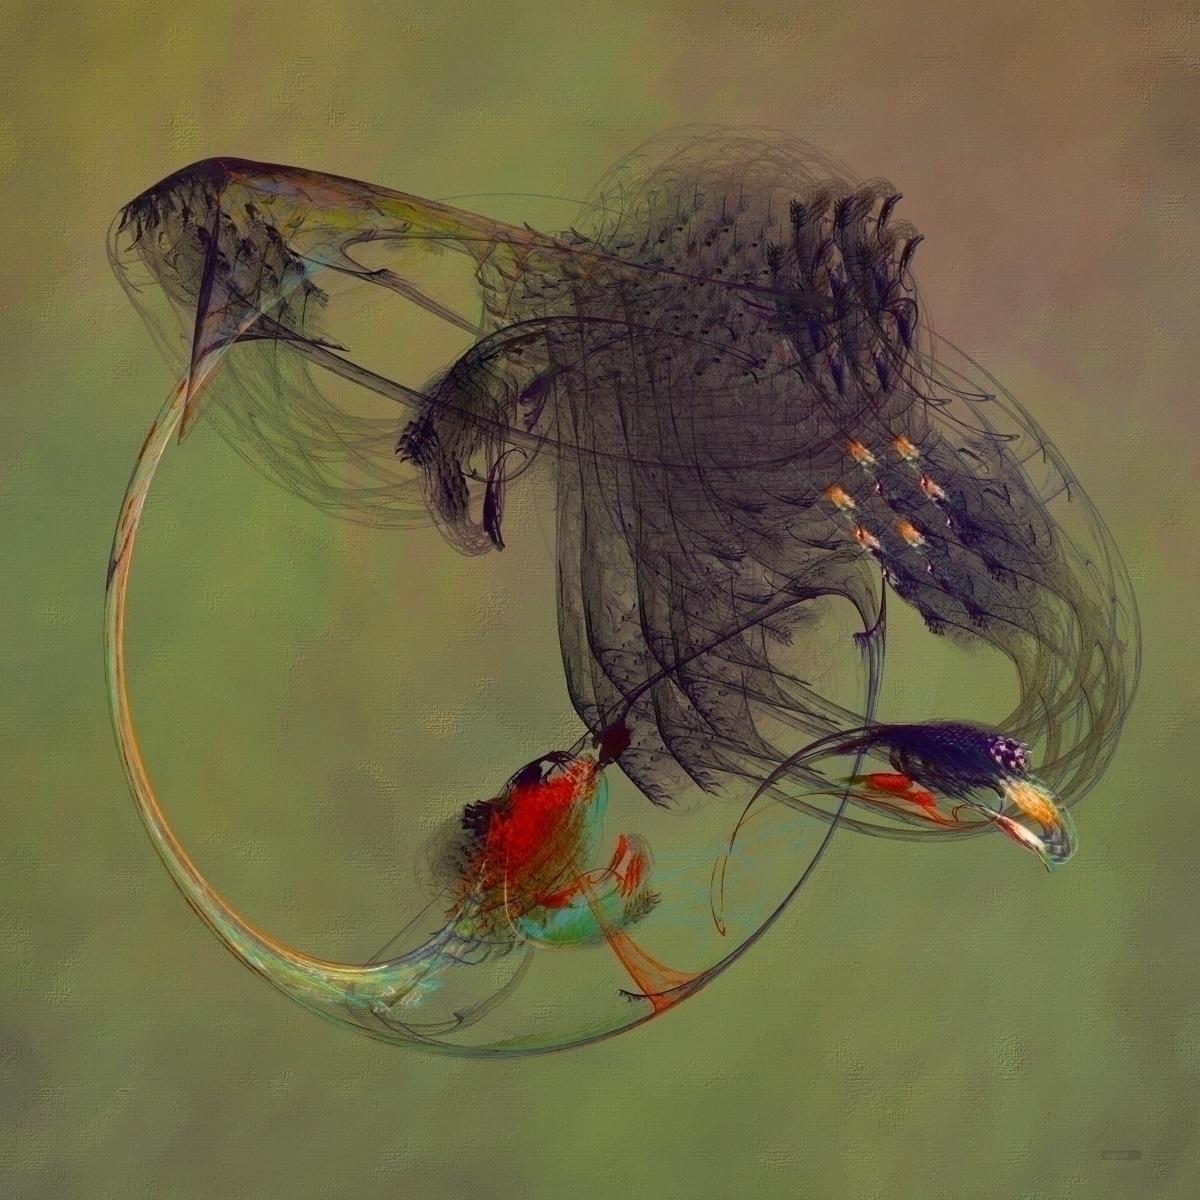 Black Feather Study Medium: Dig - ageekonabike   ello